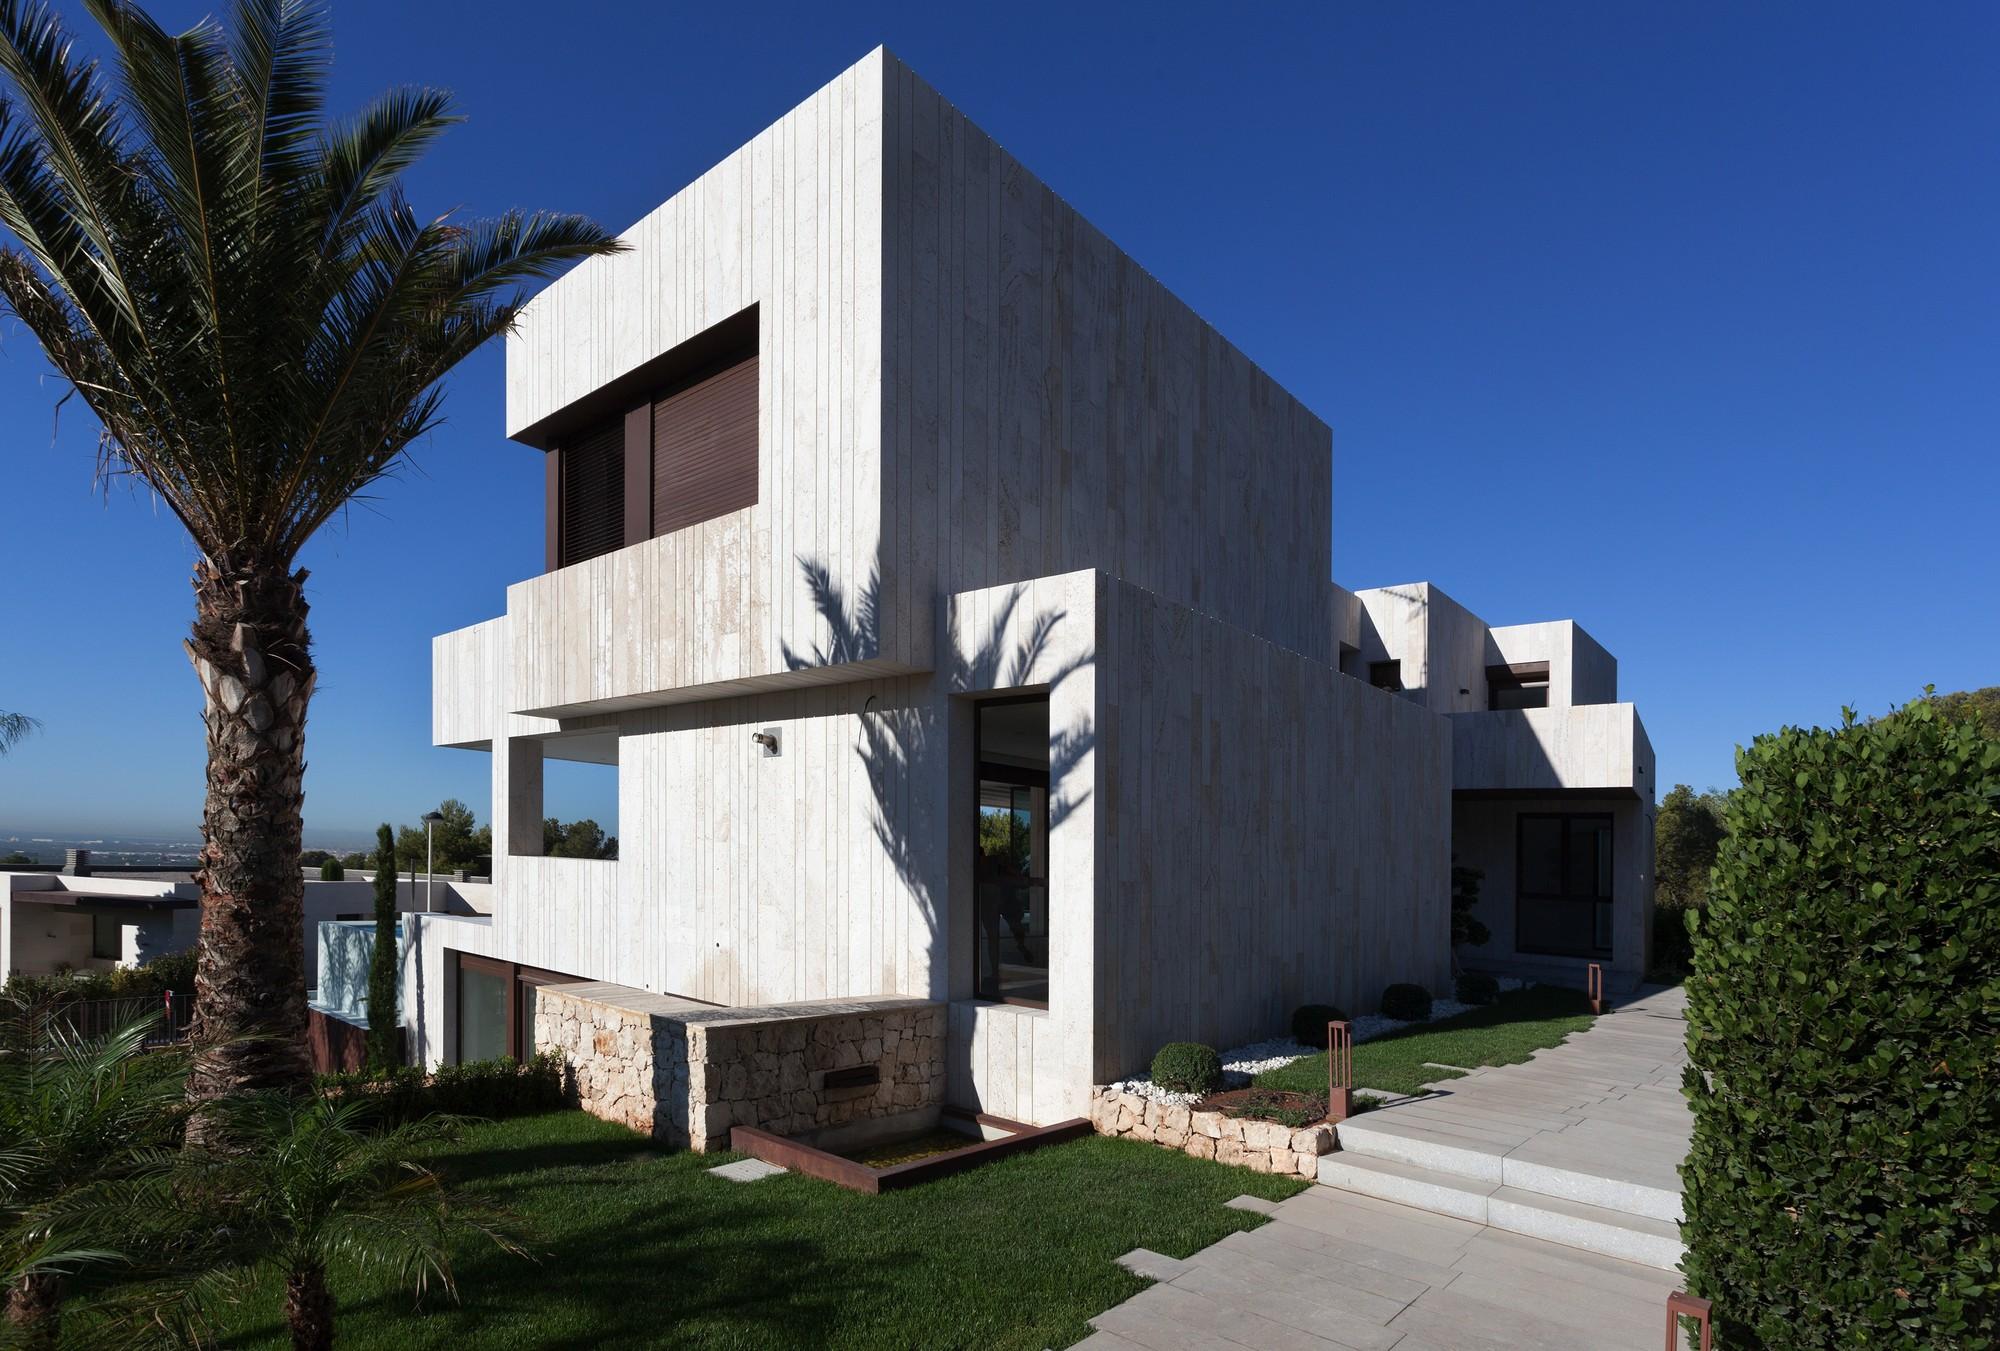 Monasterios House / Antonio Altarriba Comes, © Diego Opazo